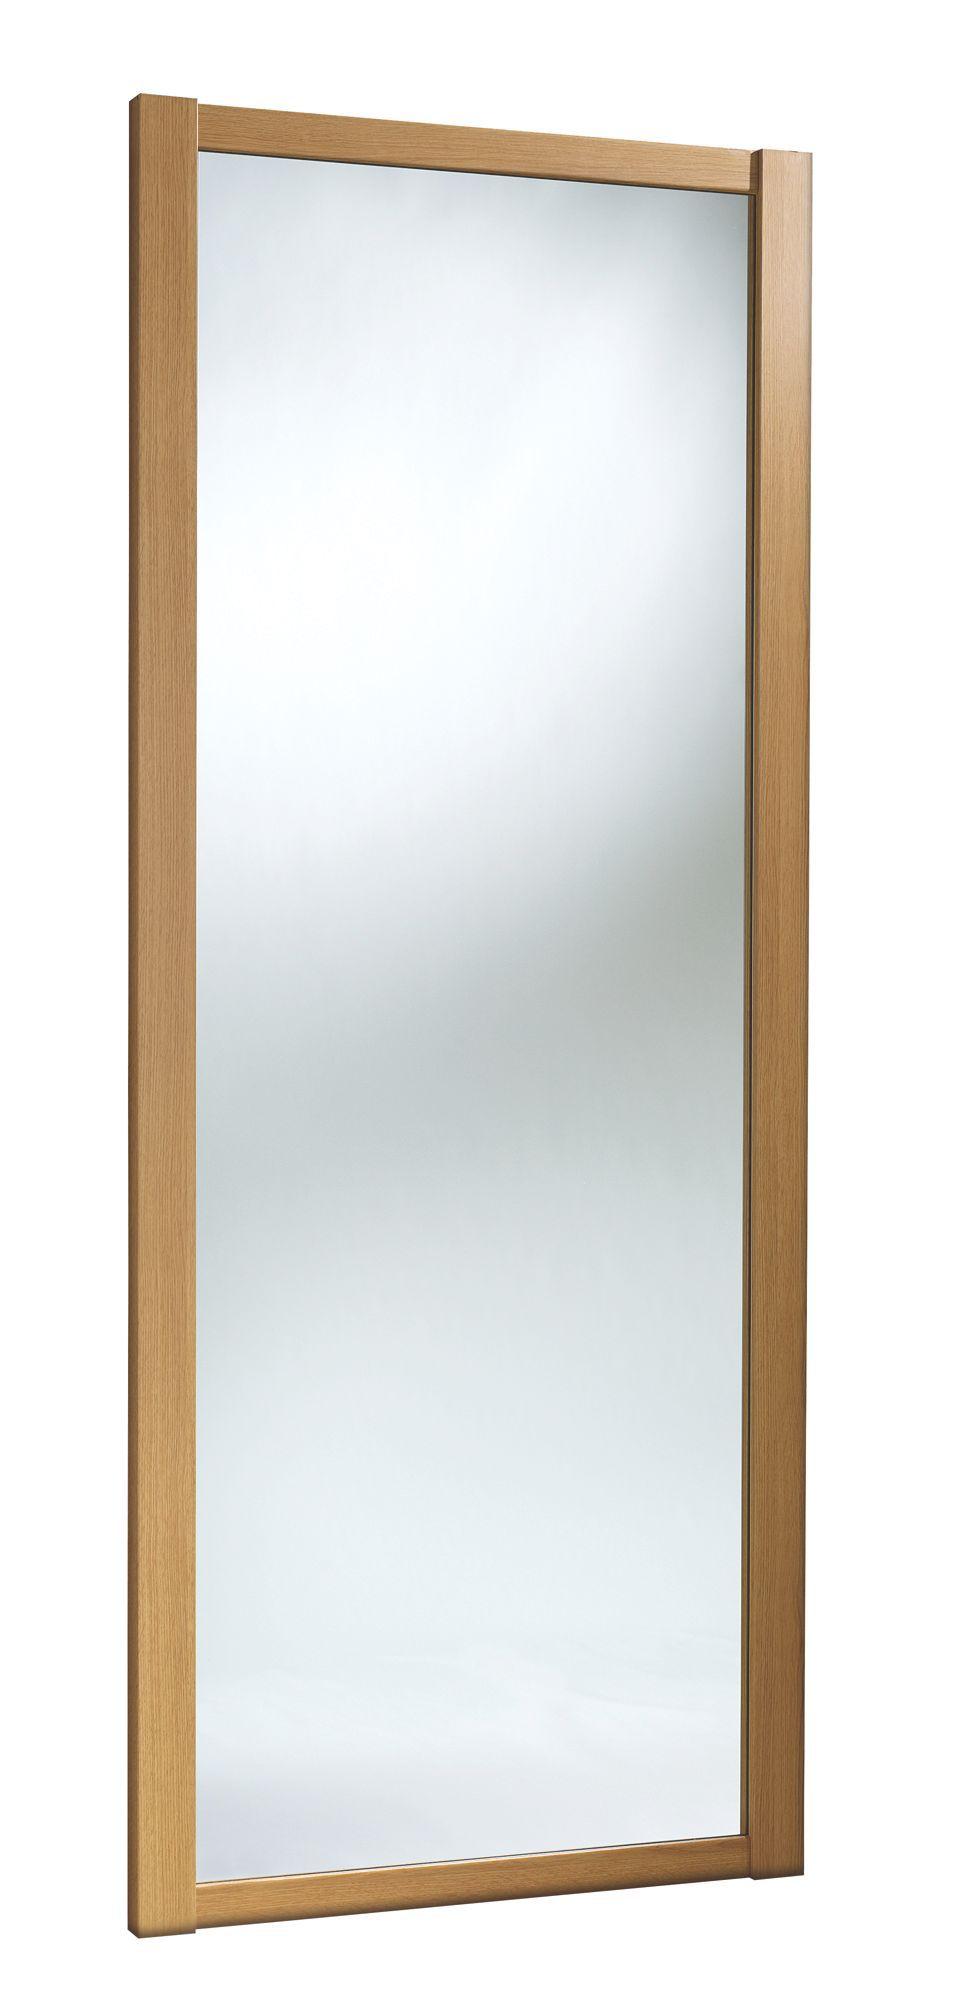 Traditional full length mirror natural oak effect sliding for B q bedrooms sliding wardrobe doors